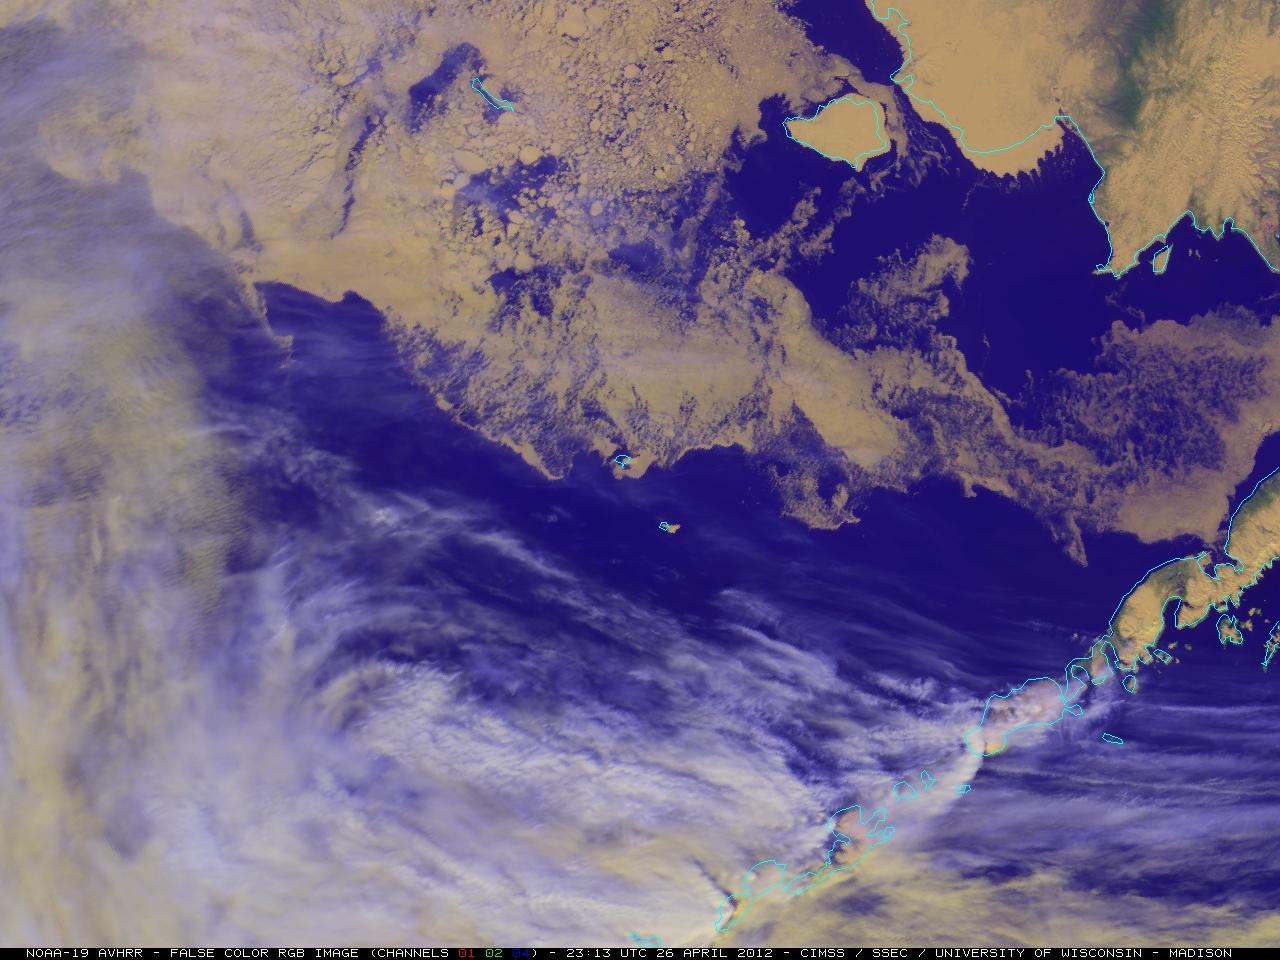 NOAA-19 AVHRR false-color Red/Green/Blue (RGB) image